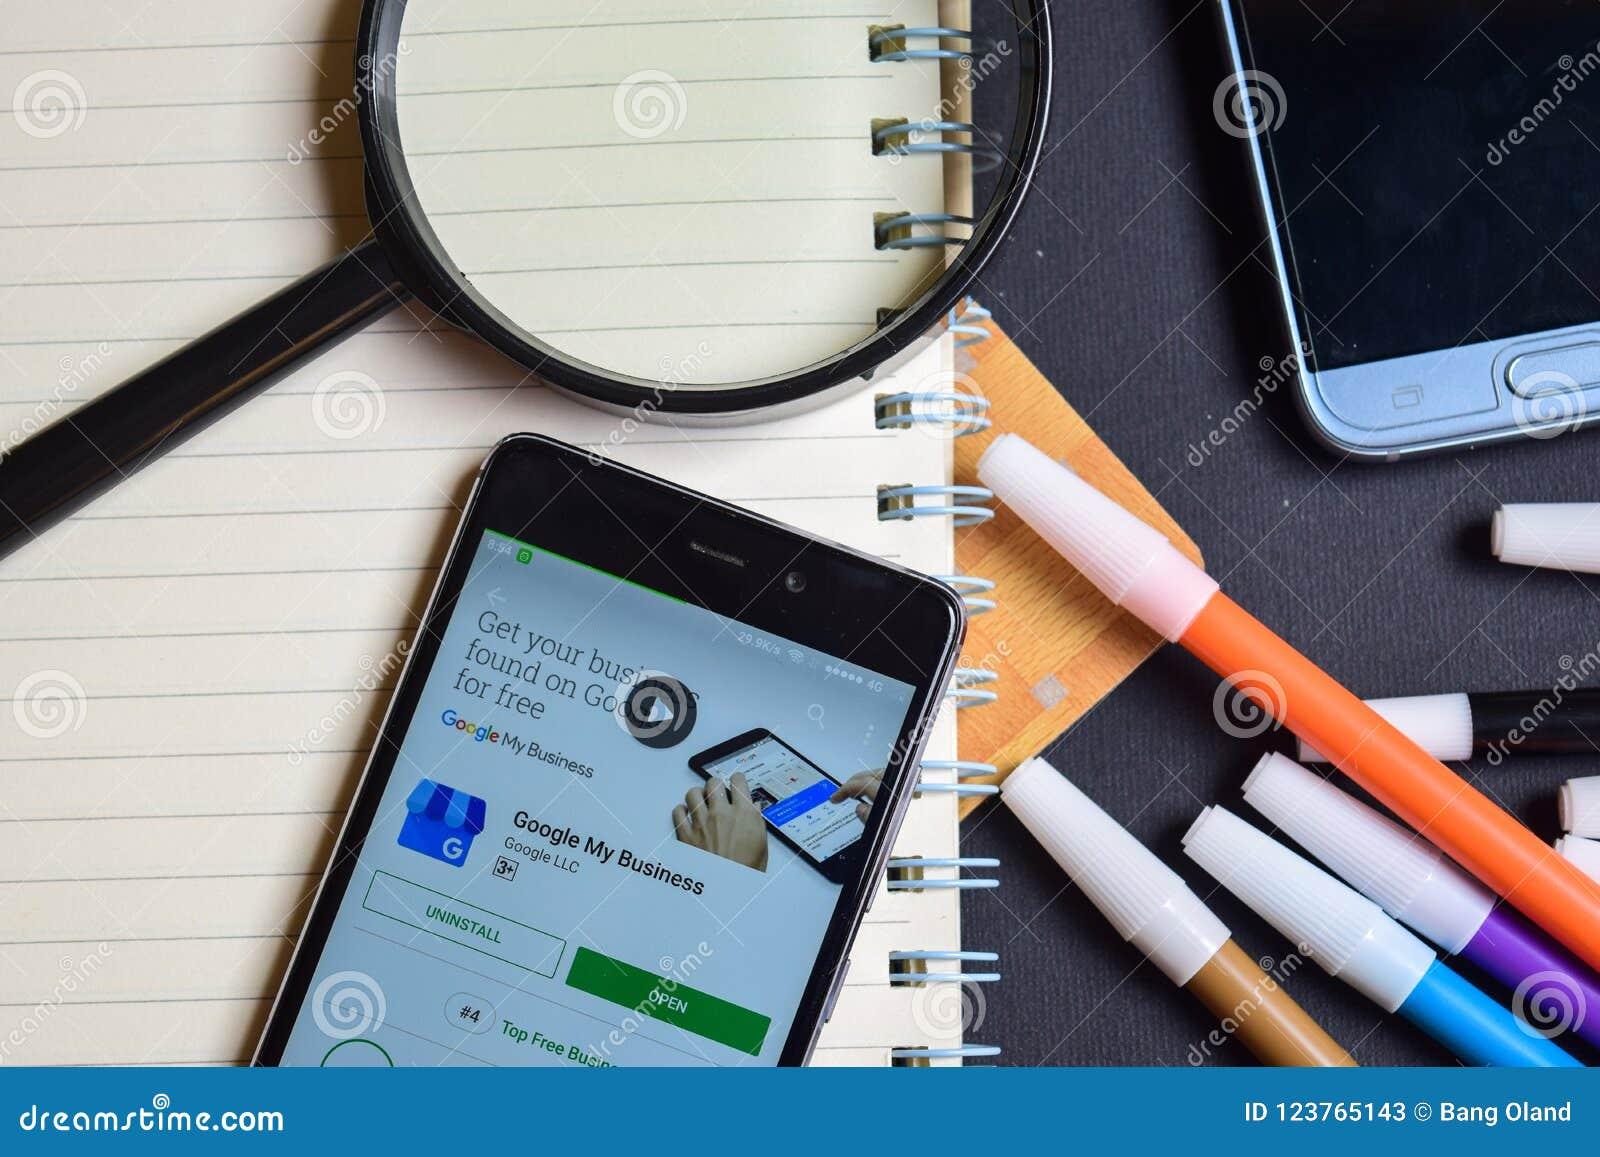 Google Play Books App On Smartphone ScreenGoogle My Business App On